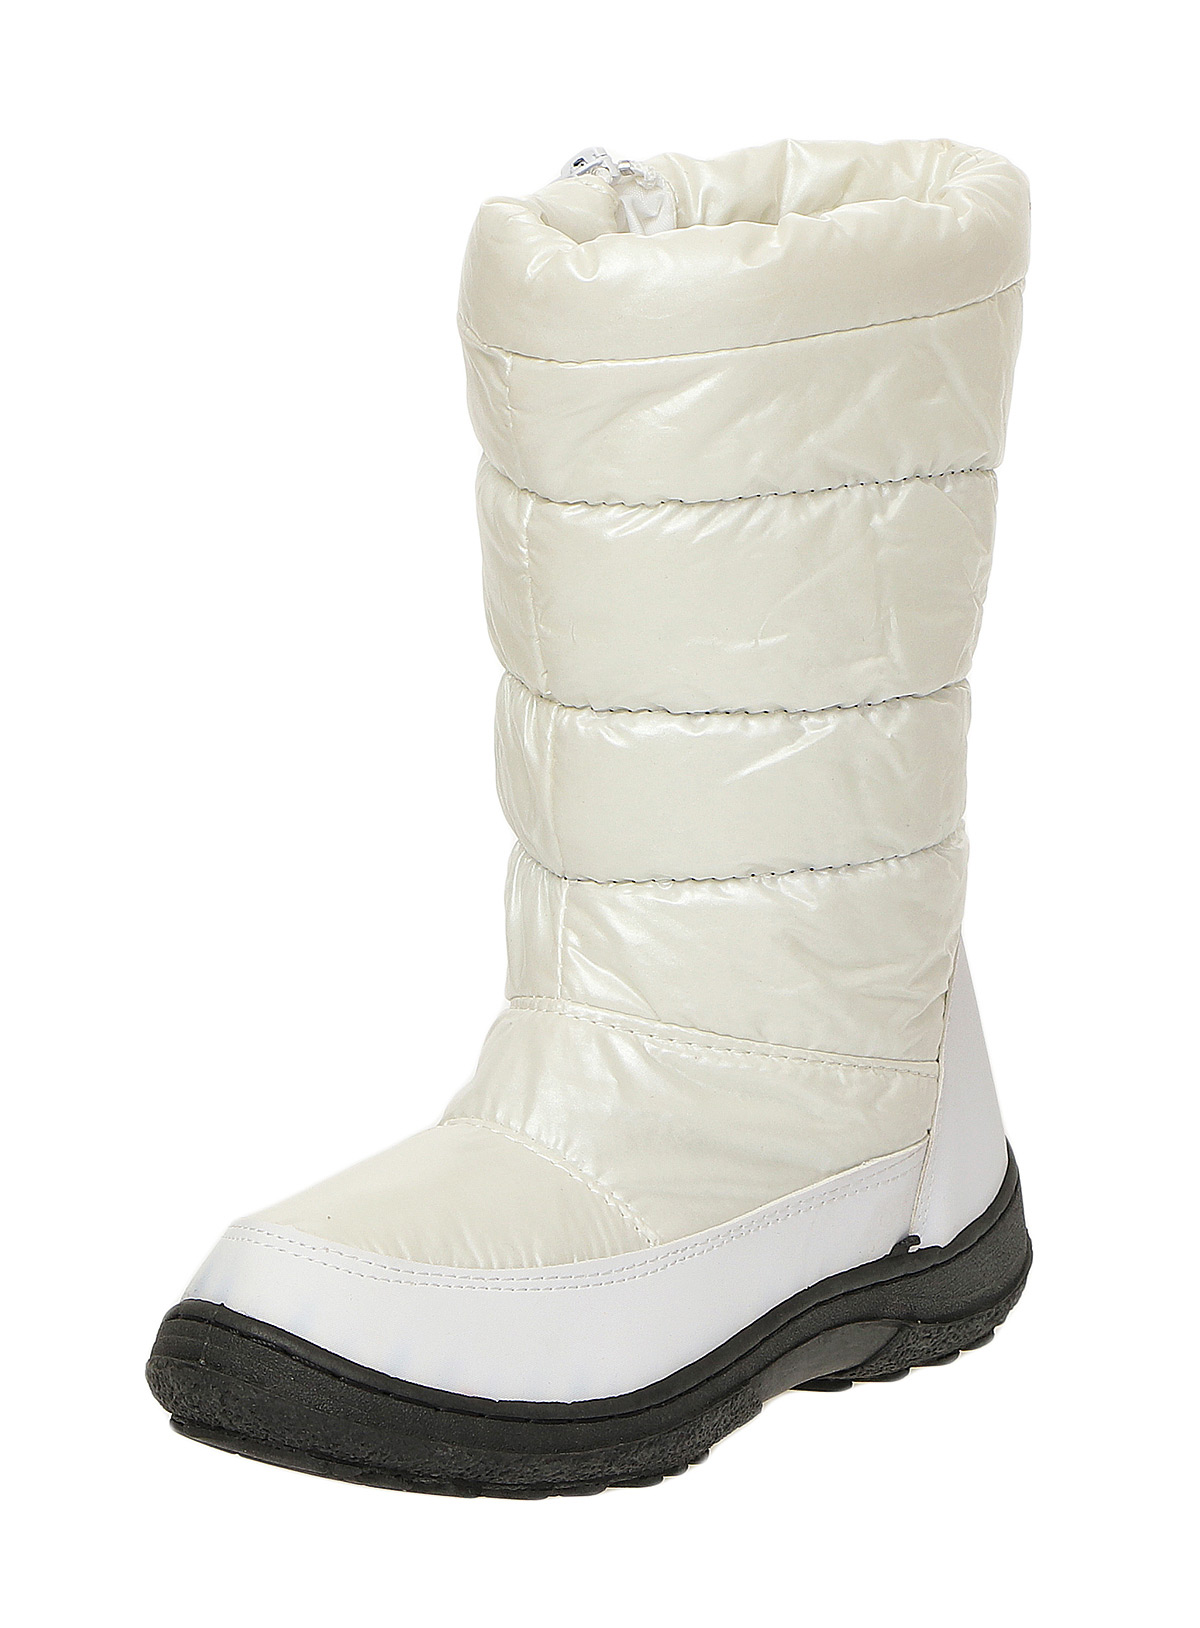 damen winterstiefel thermostiefel schneestiefel boots. Black Bedroom Furniture Sets. Home Design Ideas